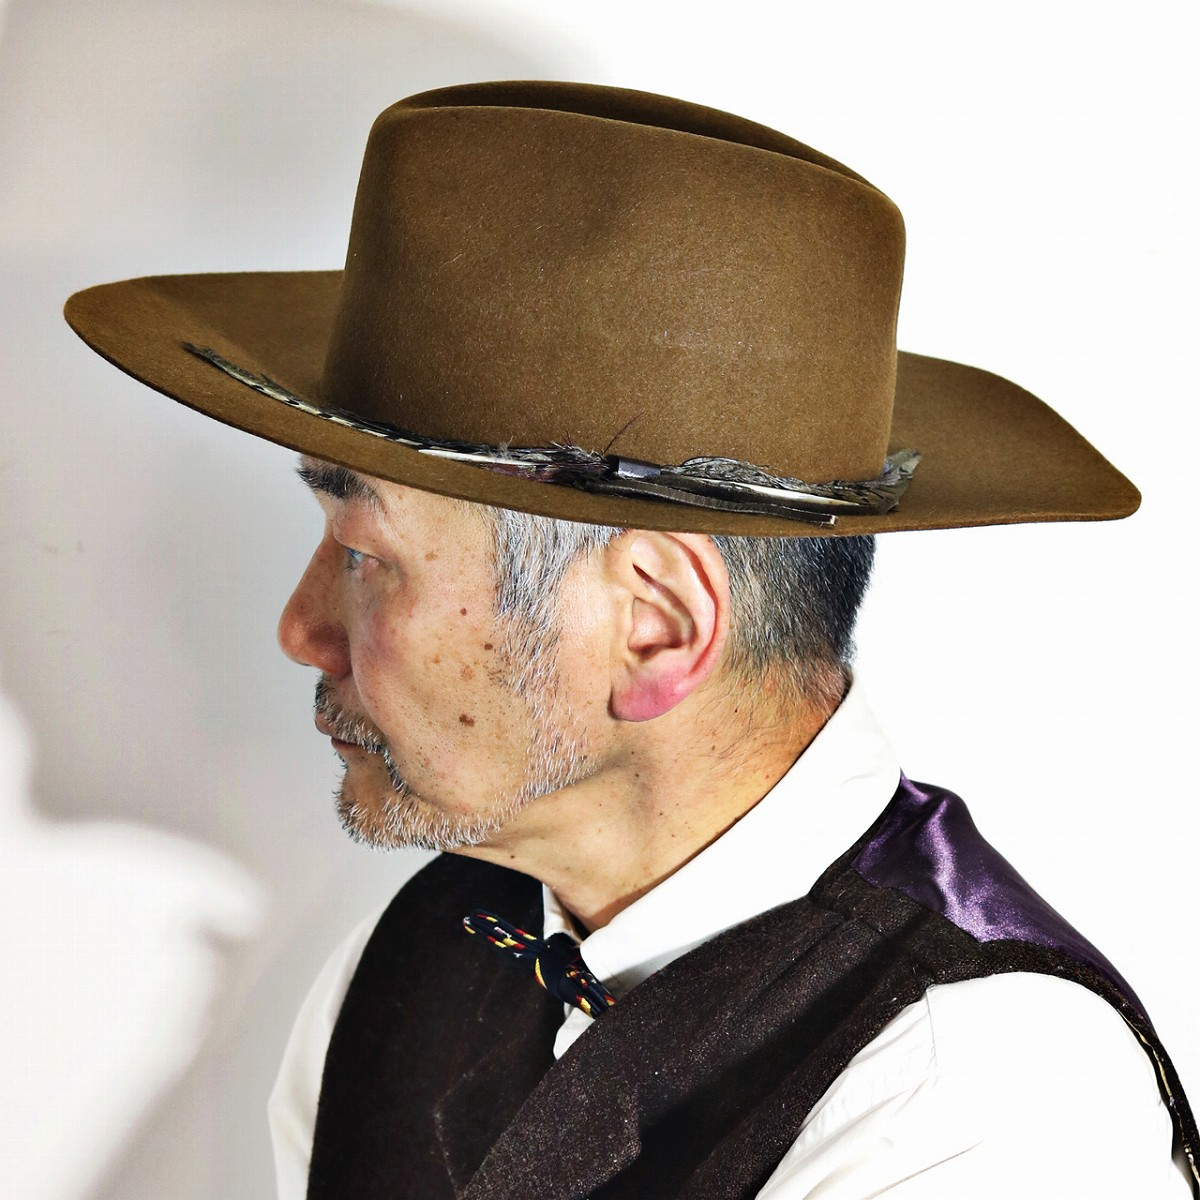 Hat Felt Cowboy Hat Trilby Hat Gentleman 57cm 59cm Brown Camel Cowboy Hat Made In Stetson Felt Hat Broad Brimmed Stetson Western Hat Feather Flat